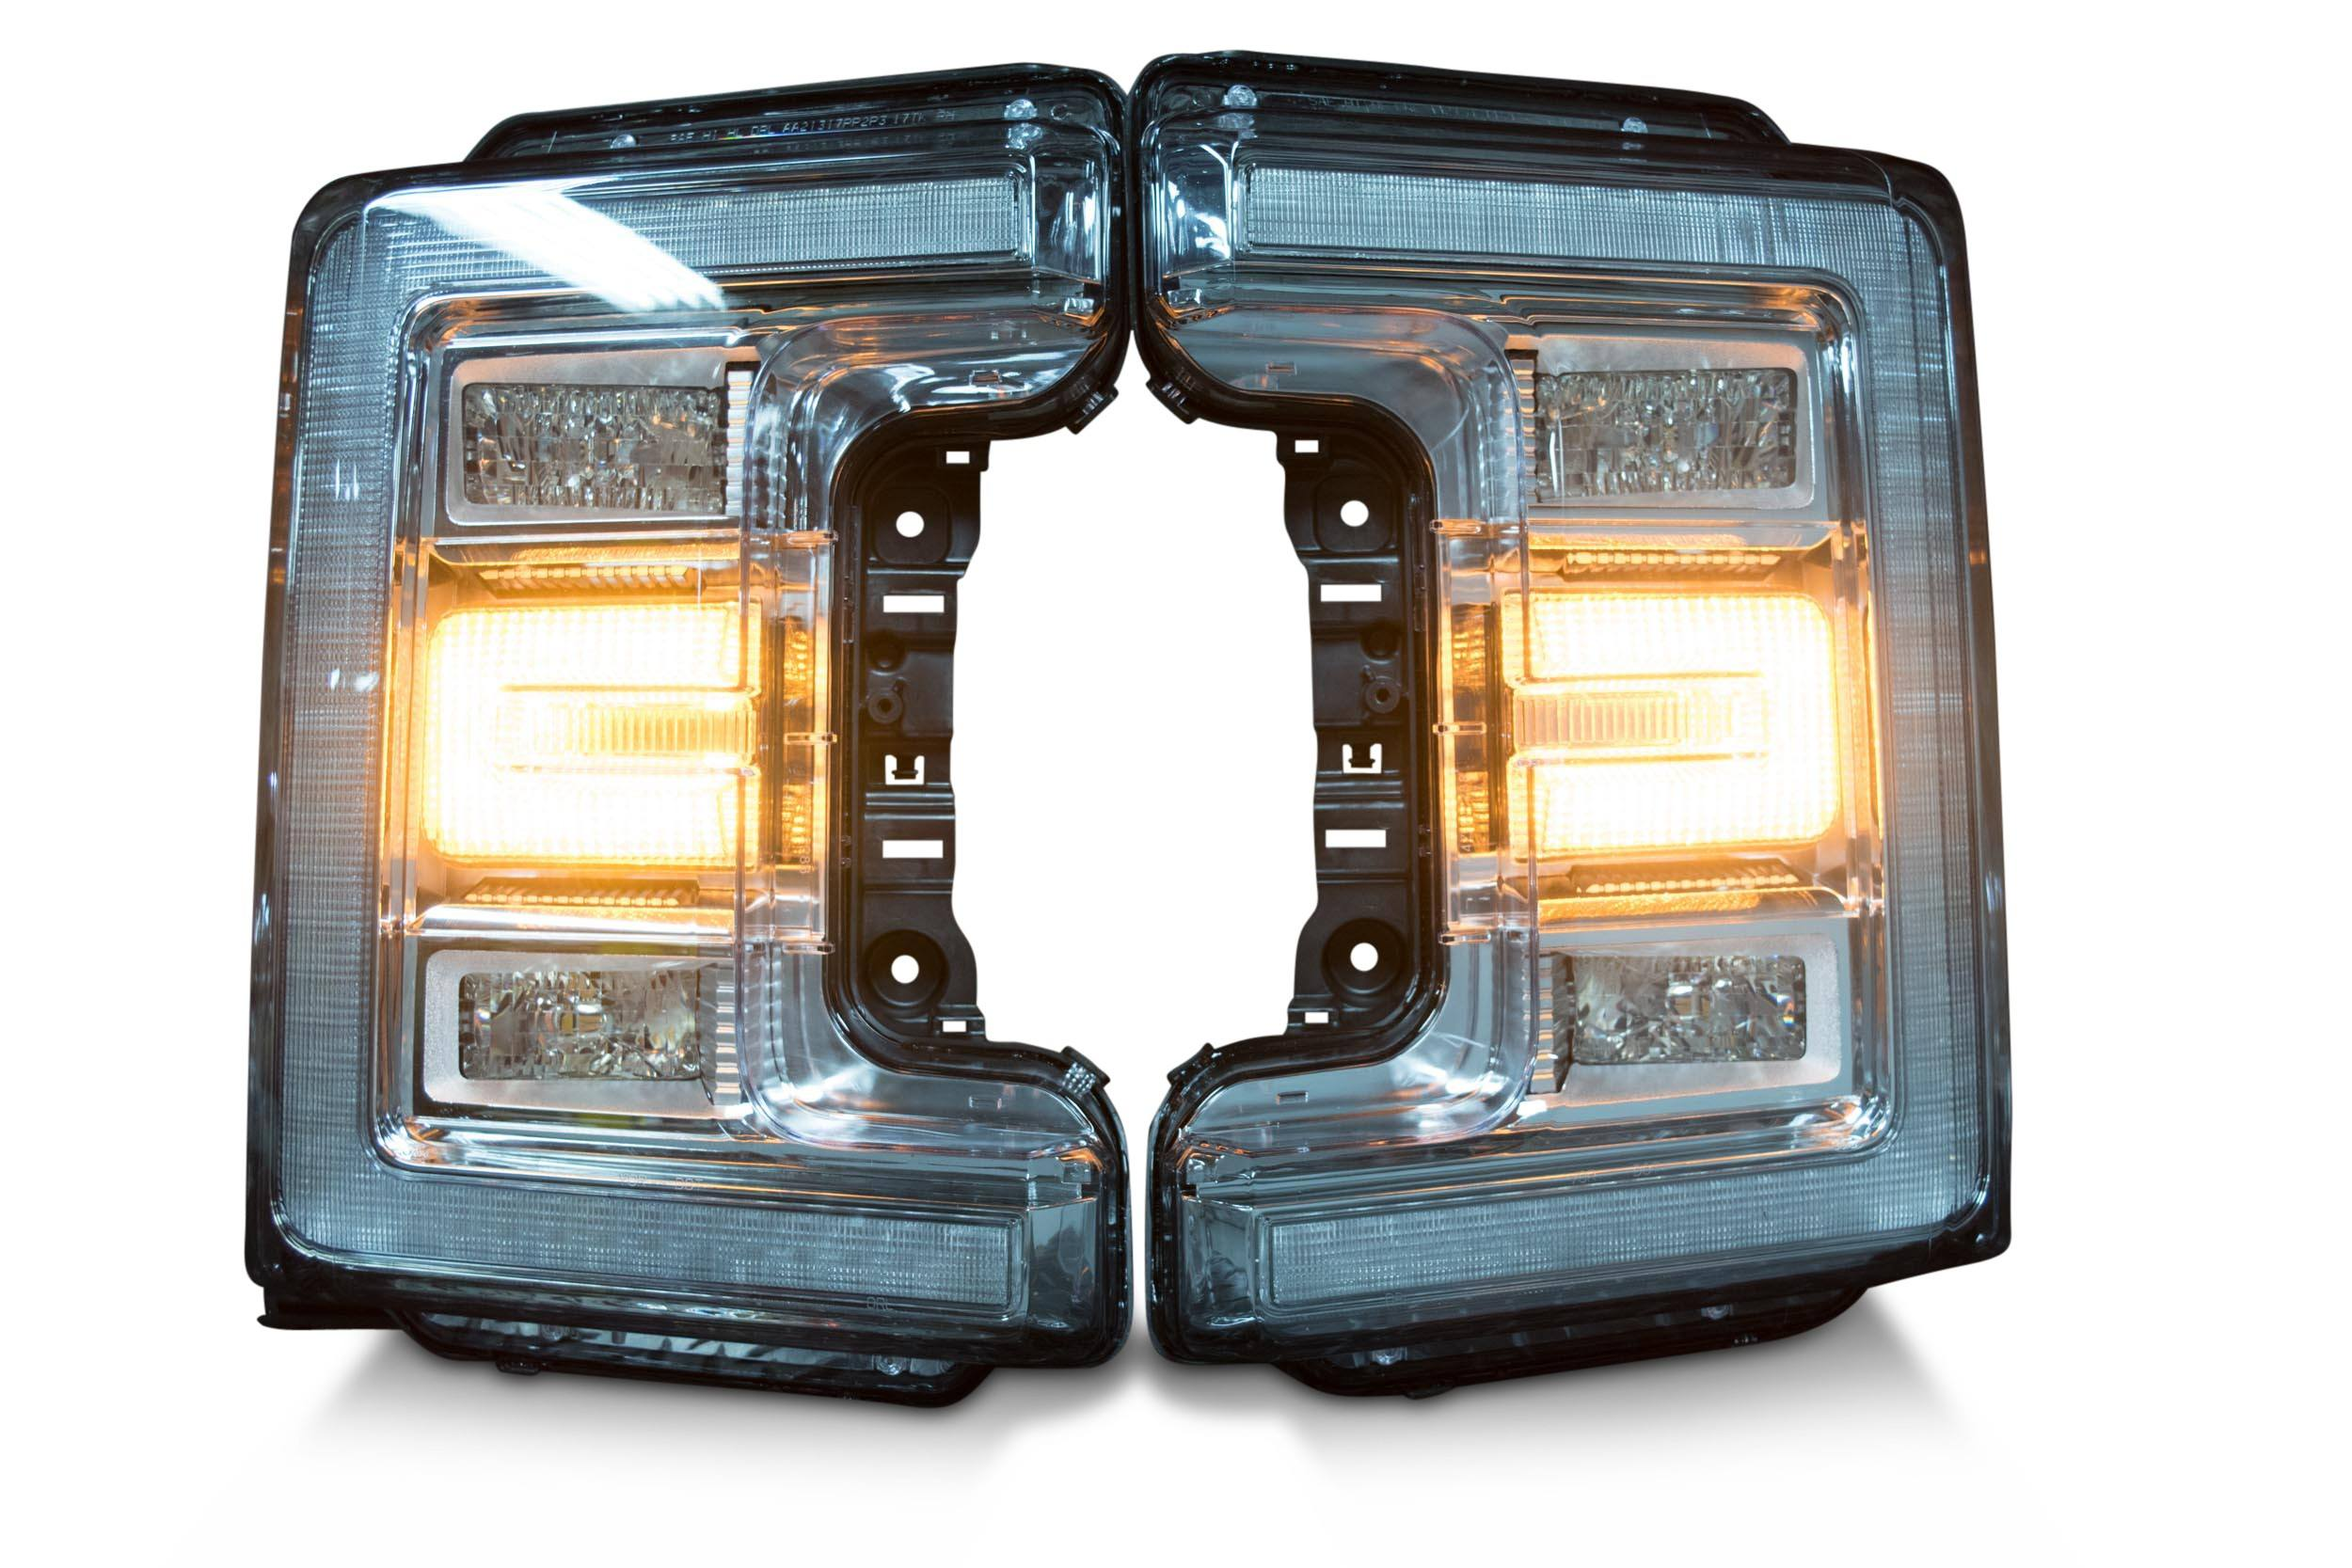 Ford F 250 Fog Light Wiring Harness Real Diagram Pair 2017 Super Duty Oem Led Headlights The Hid 2002 2010 Dodge Nitro